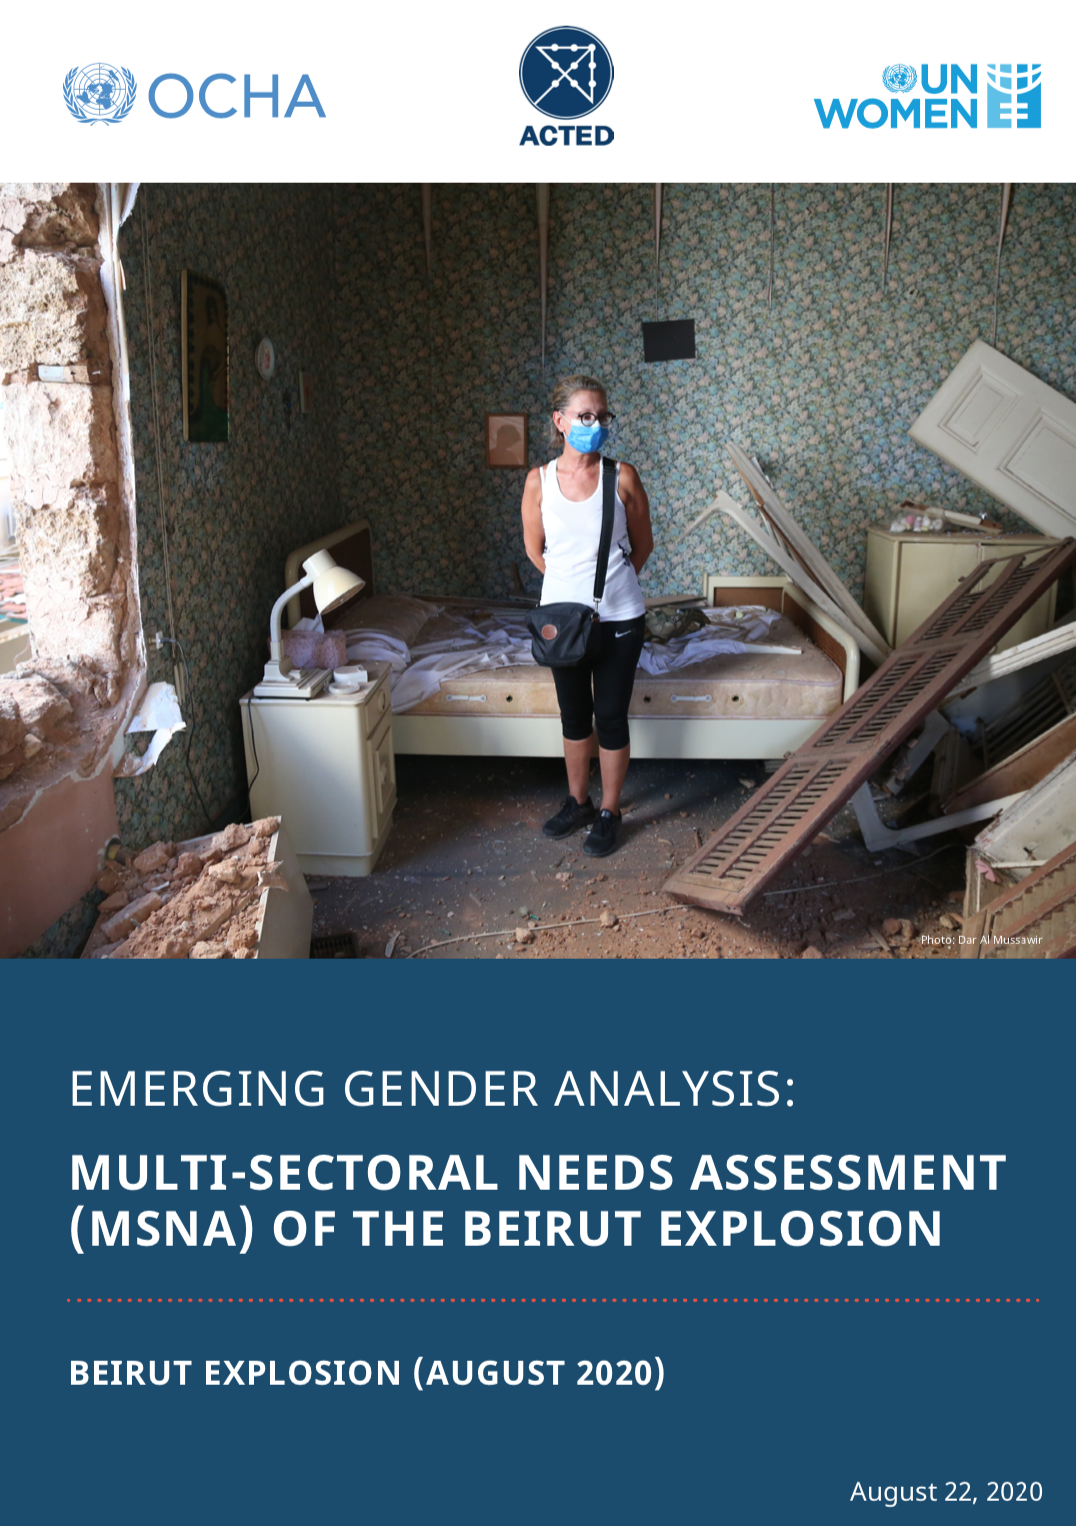 Emerging Gender Analysis: Multi-Sectoral Needs Assessment (Beirut Explosion)